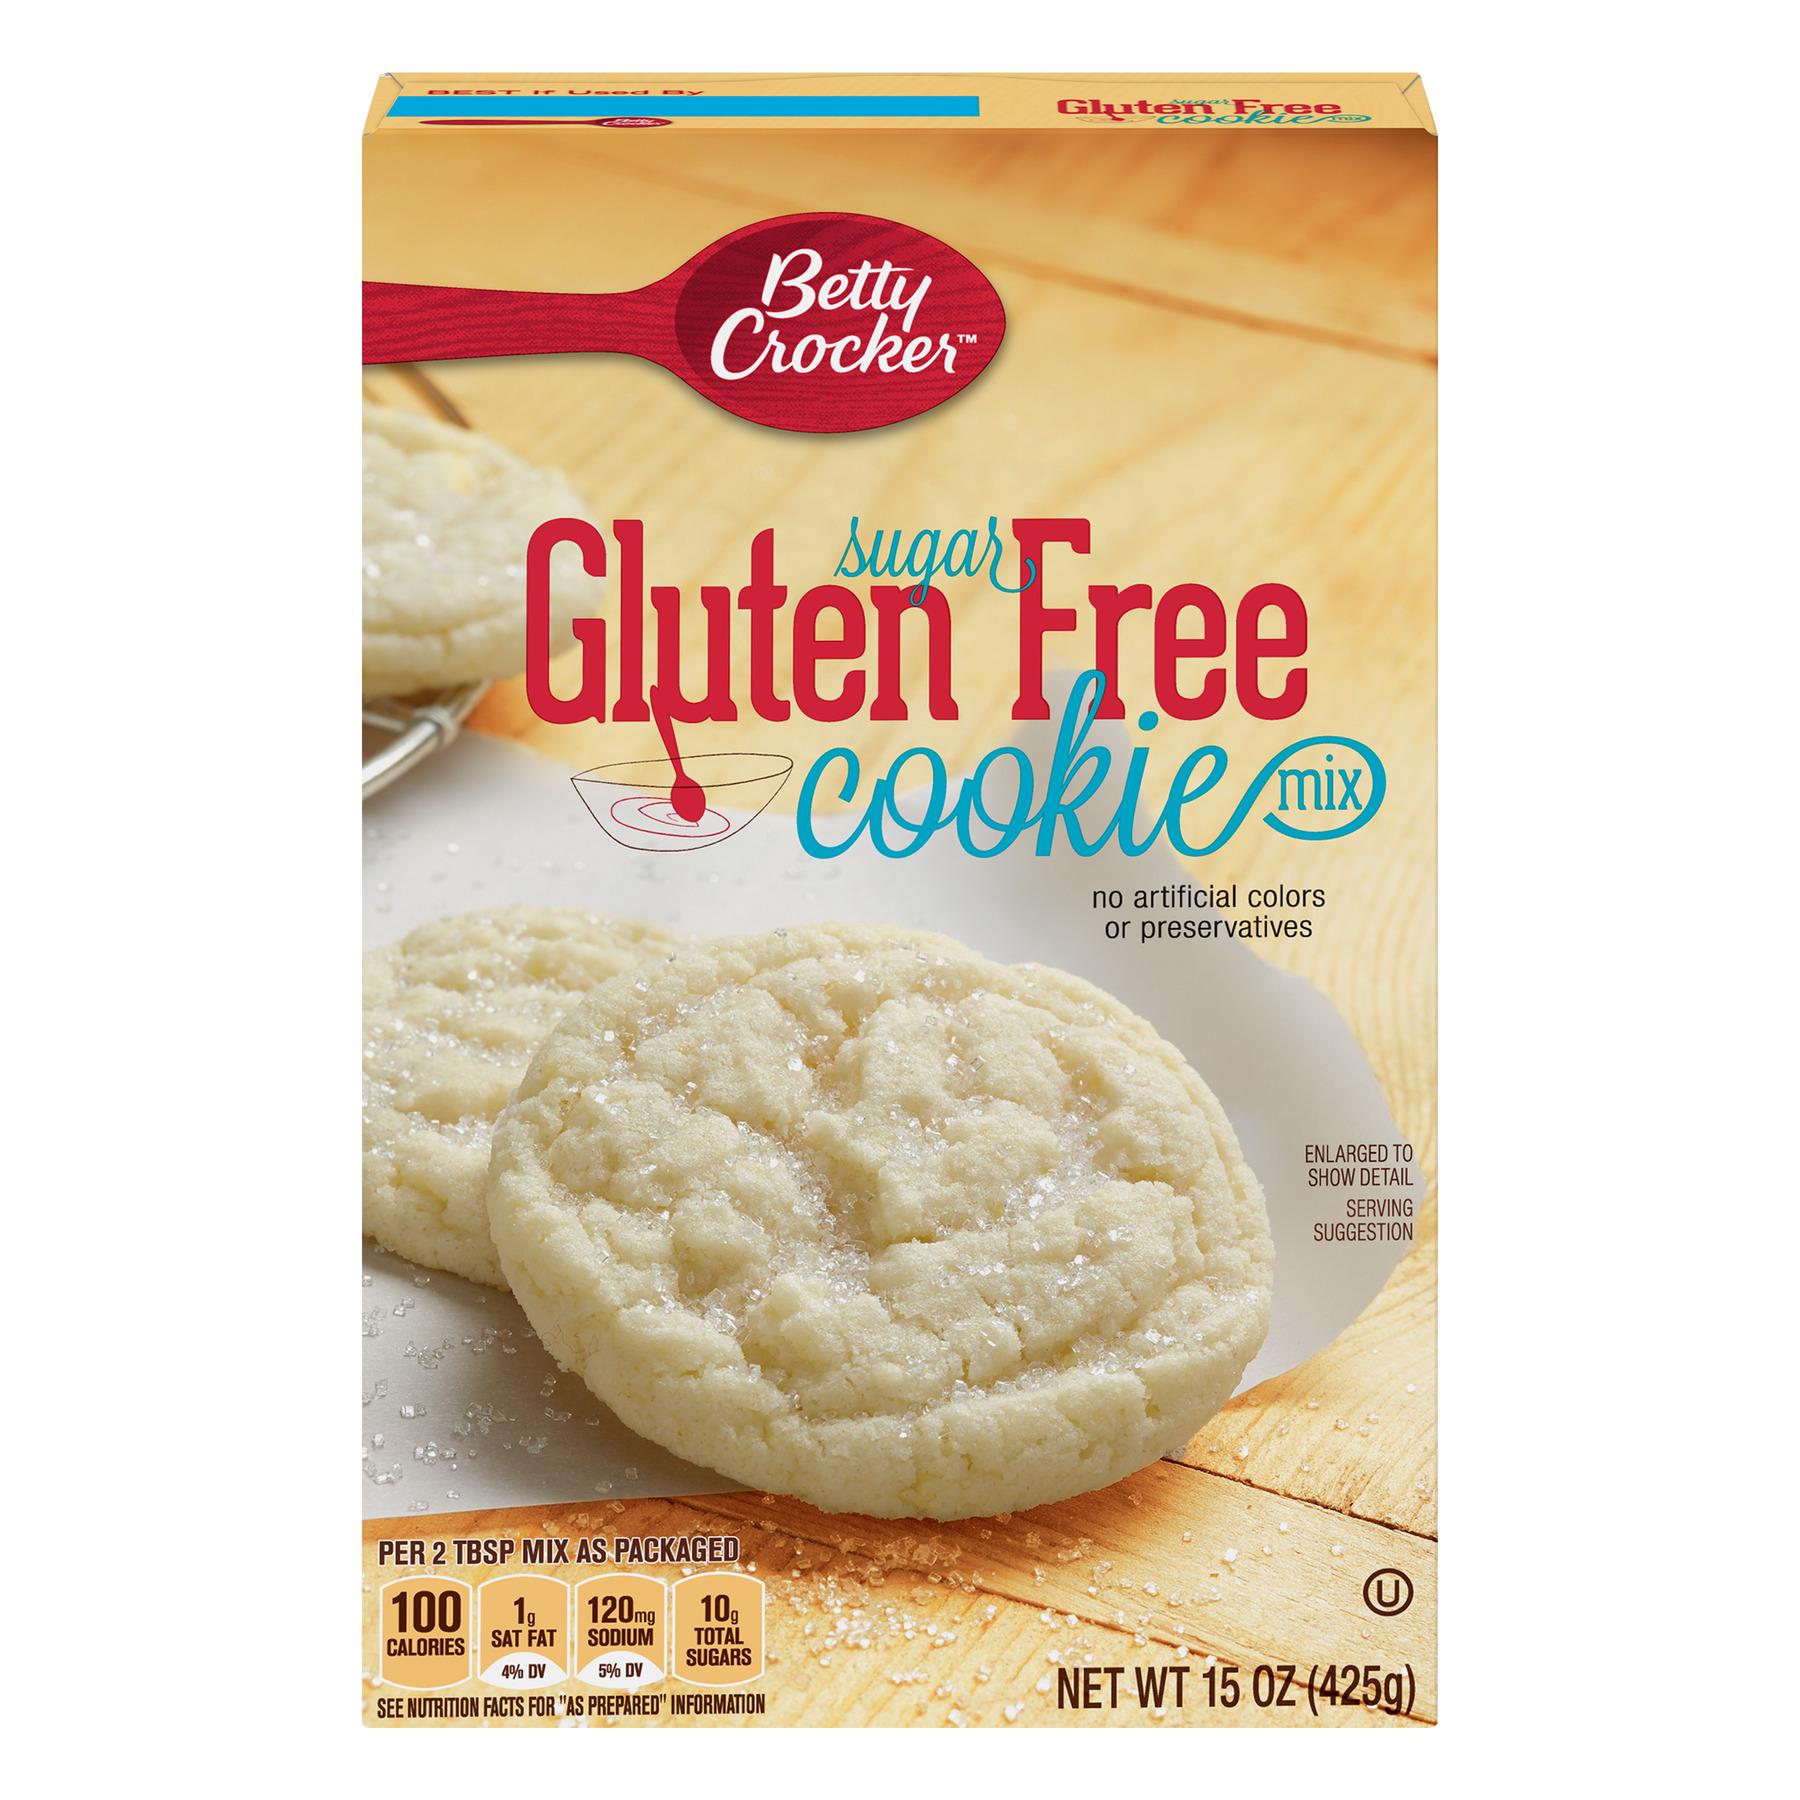 (6 Pack) Betty Crocker Baking Mix, Gluten Free Cookie Mix, Sugar, 15 oz Box